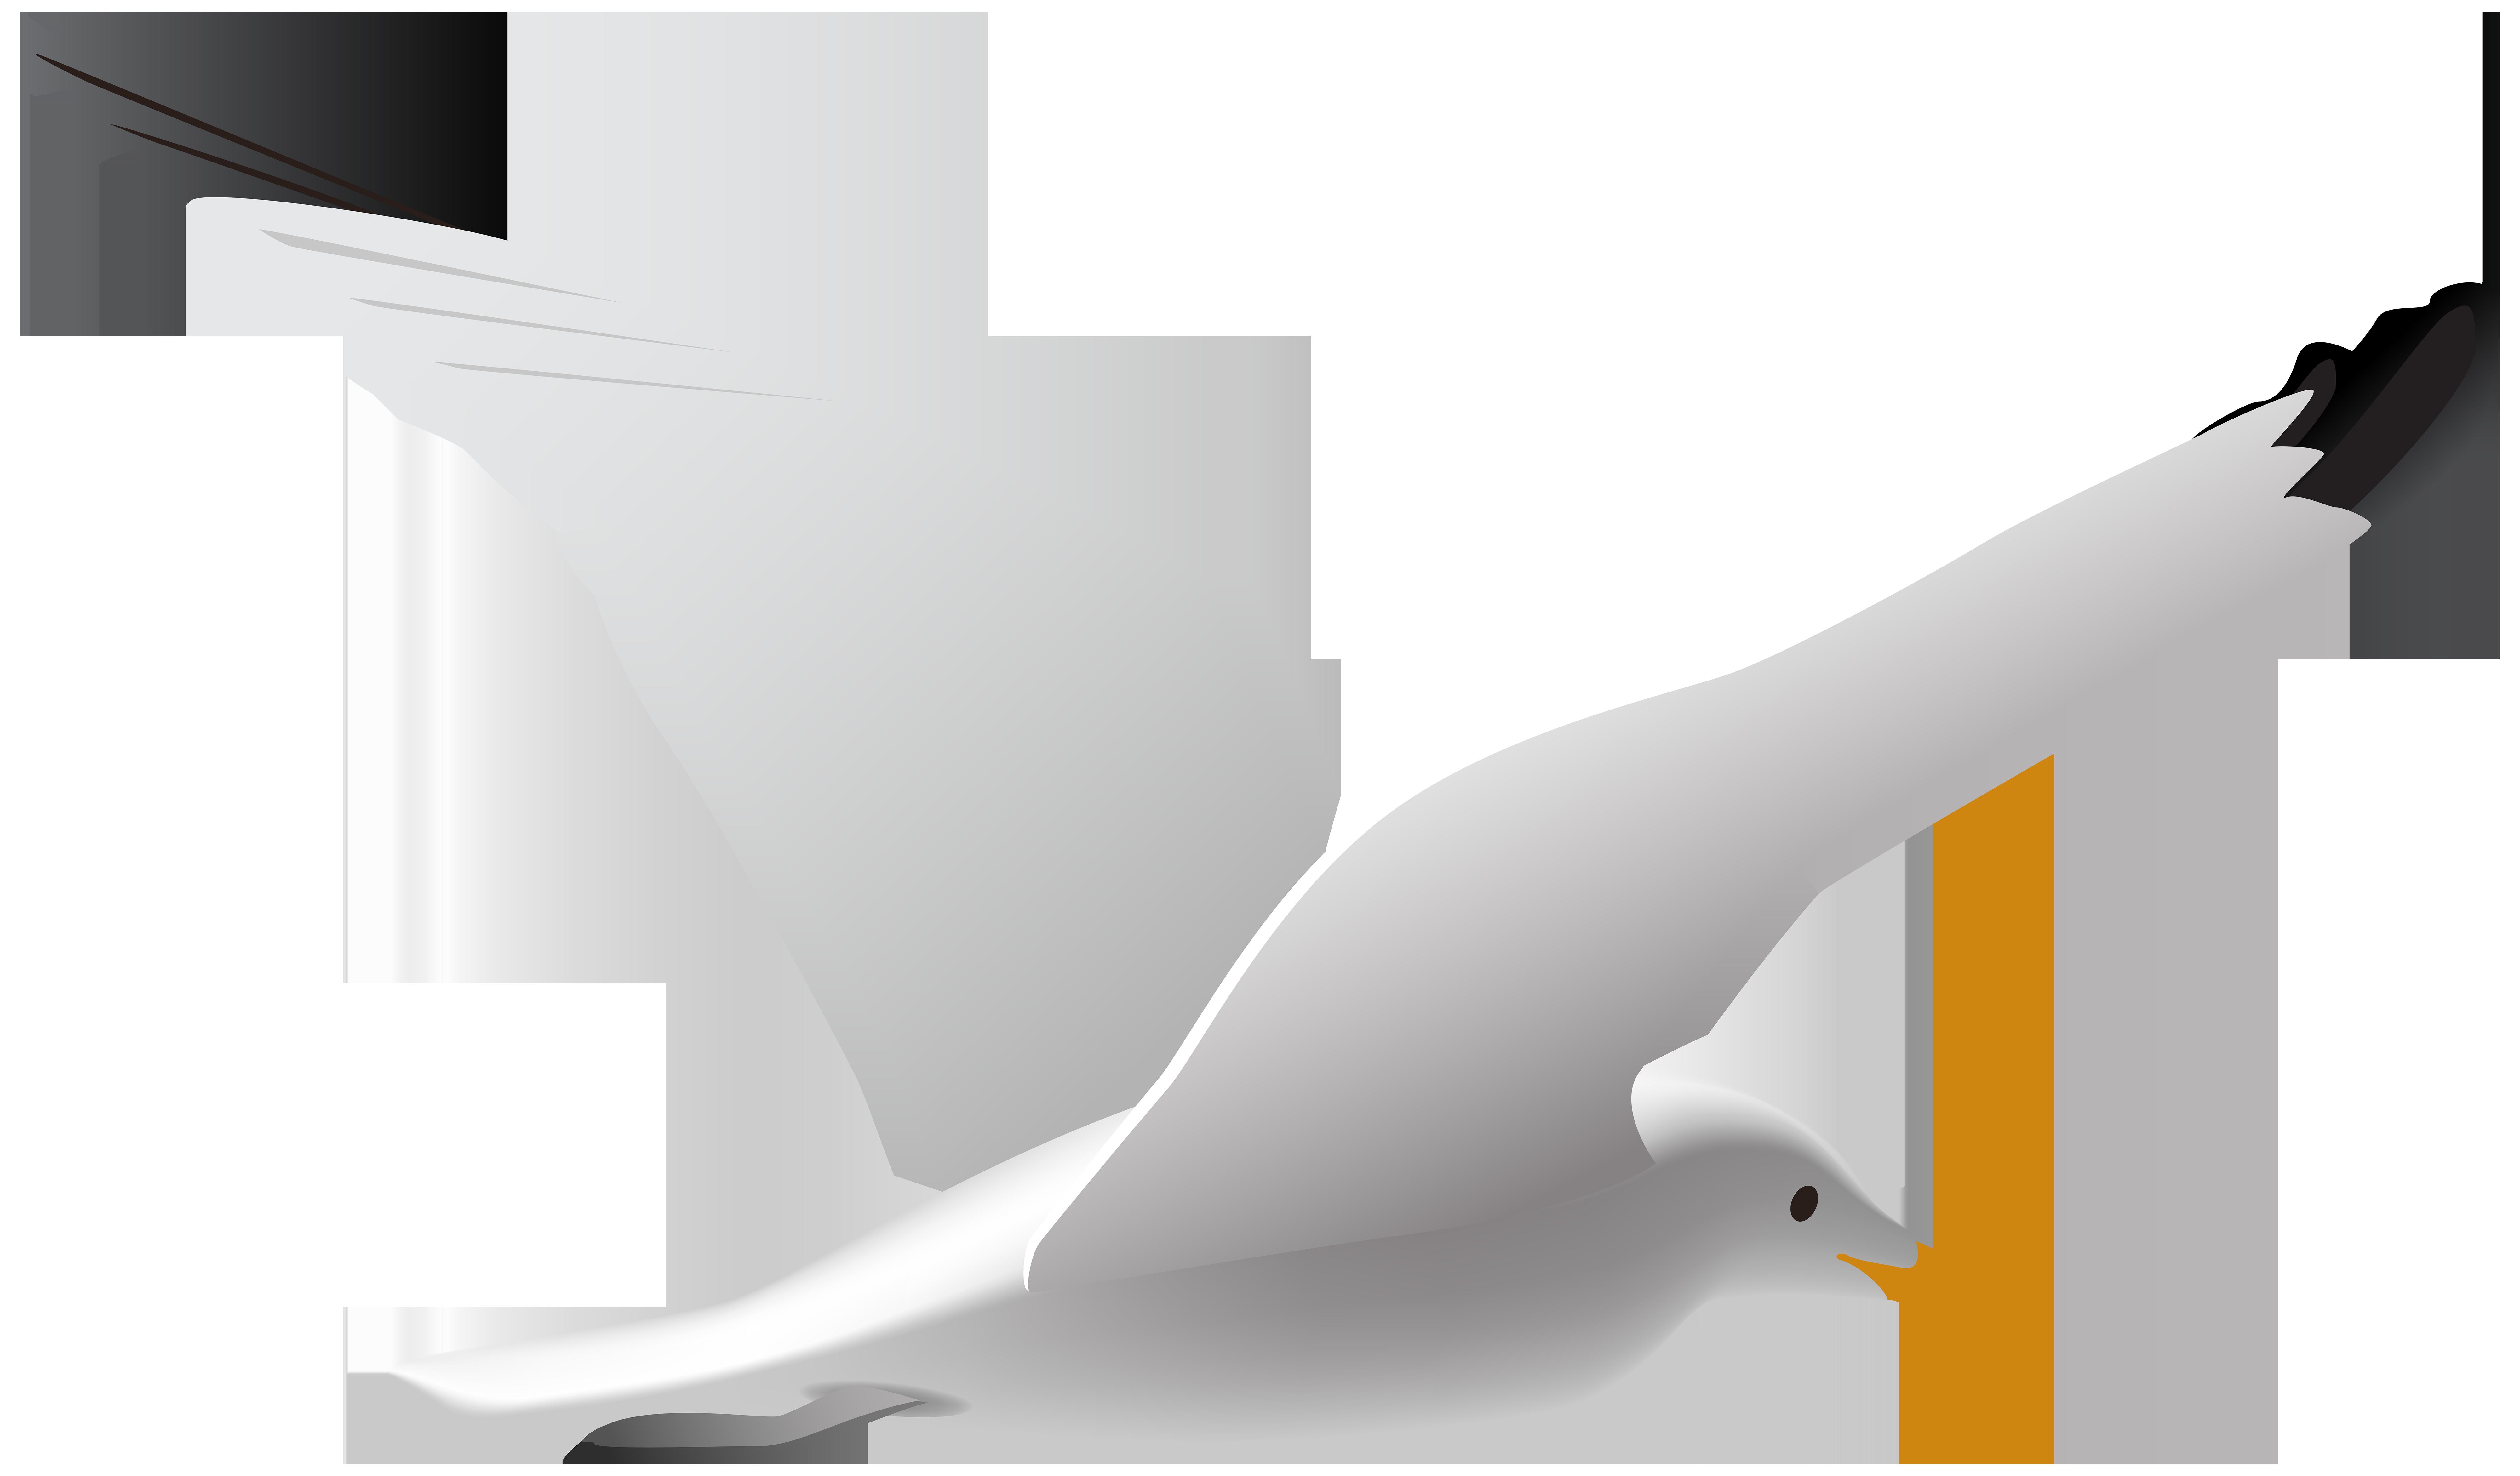 Seagull Clip Art Transparent.